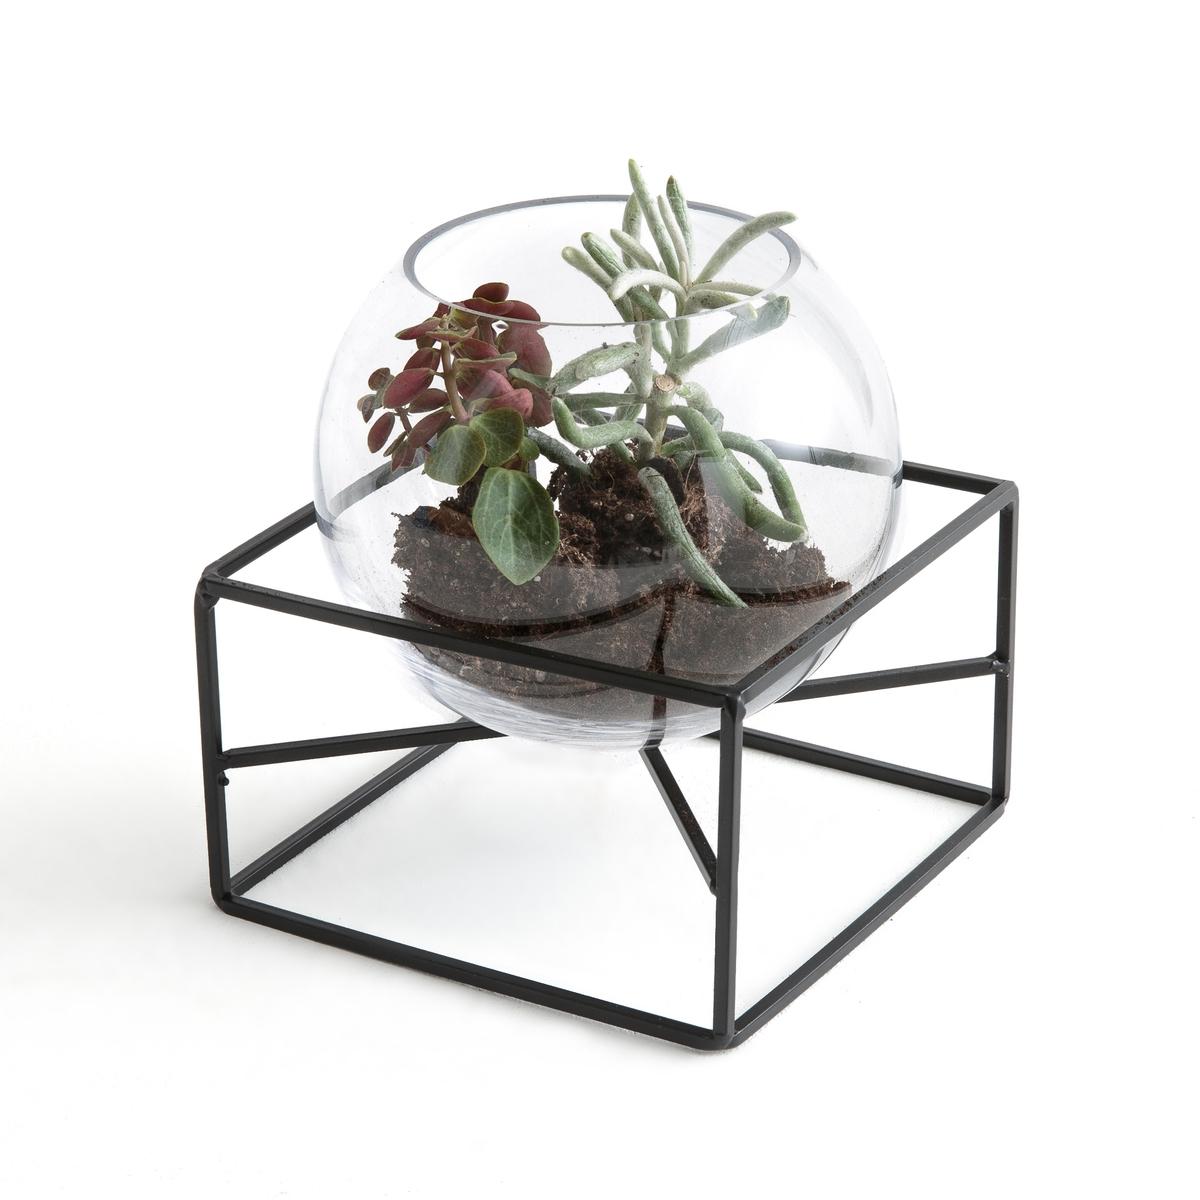 Ваза из стекла и металла TADI homereligion ваза подсвечник серебрянная из стекла